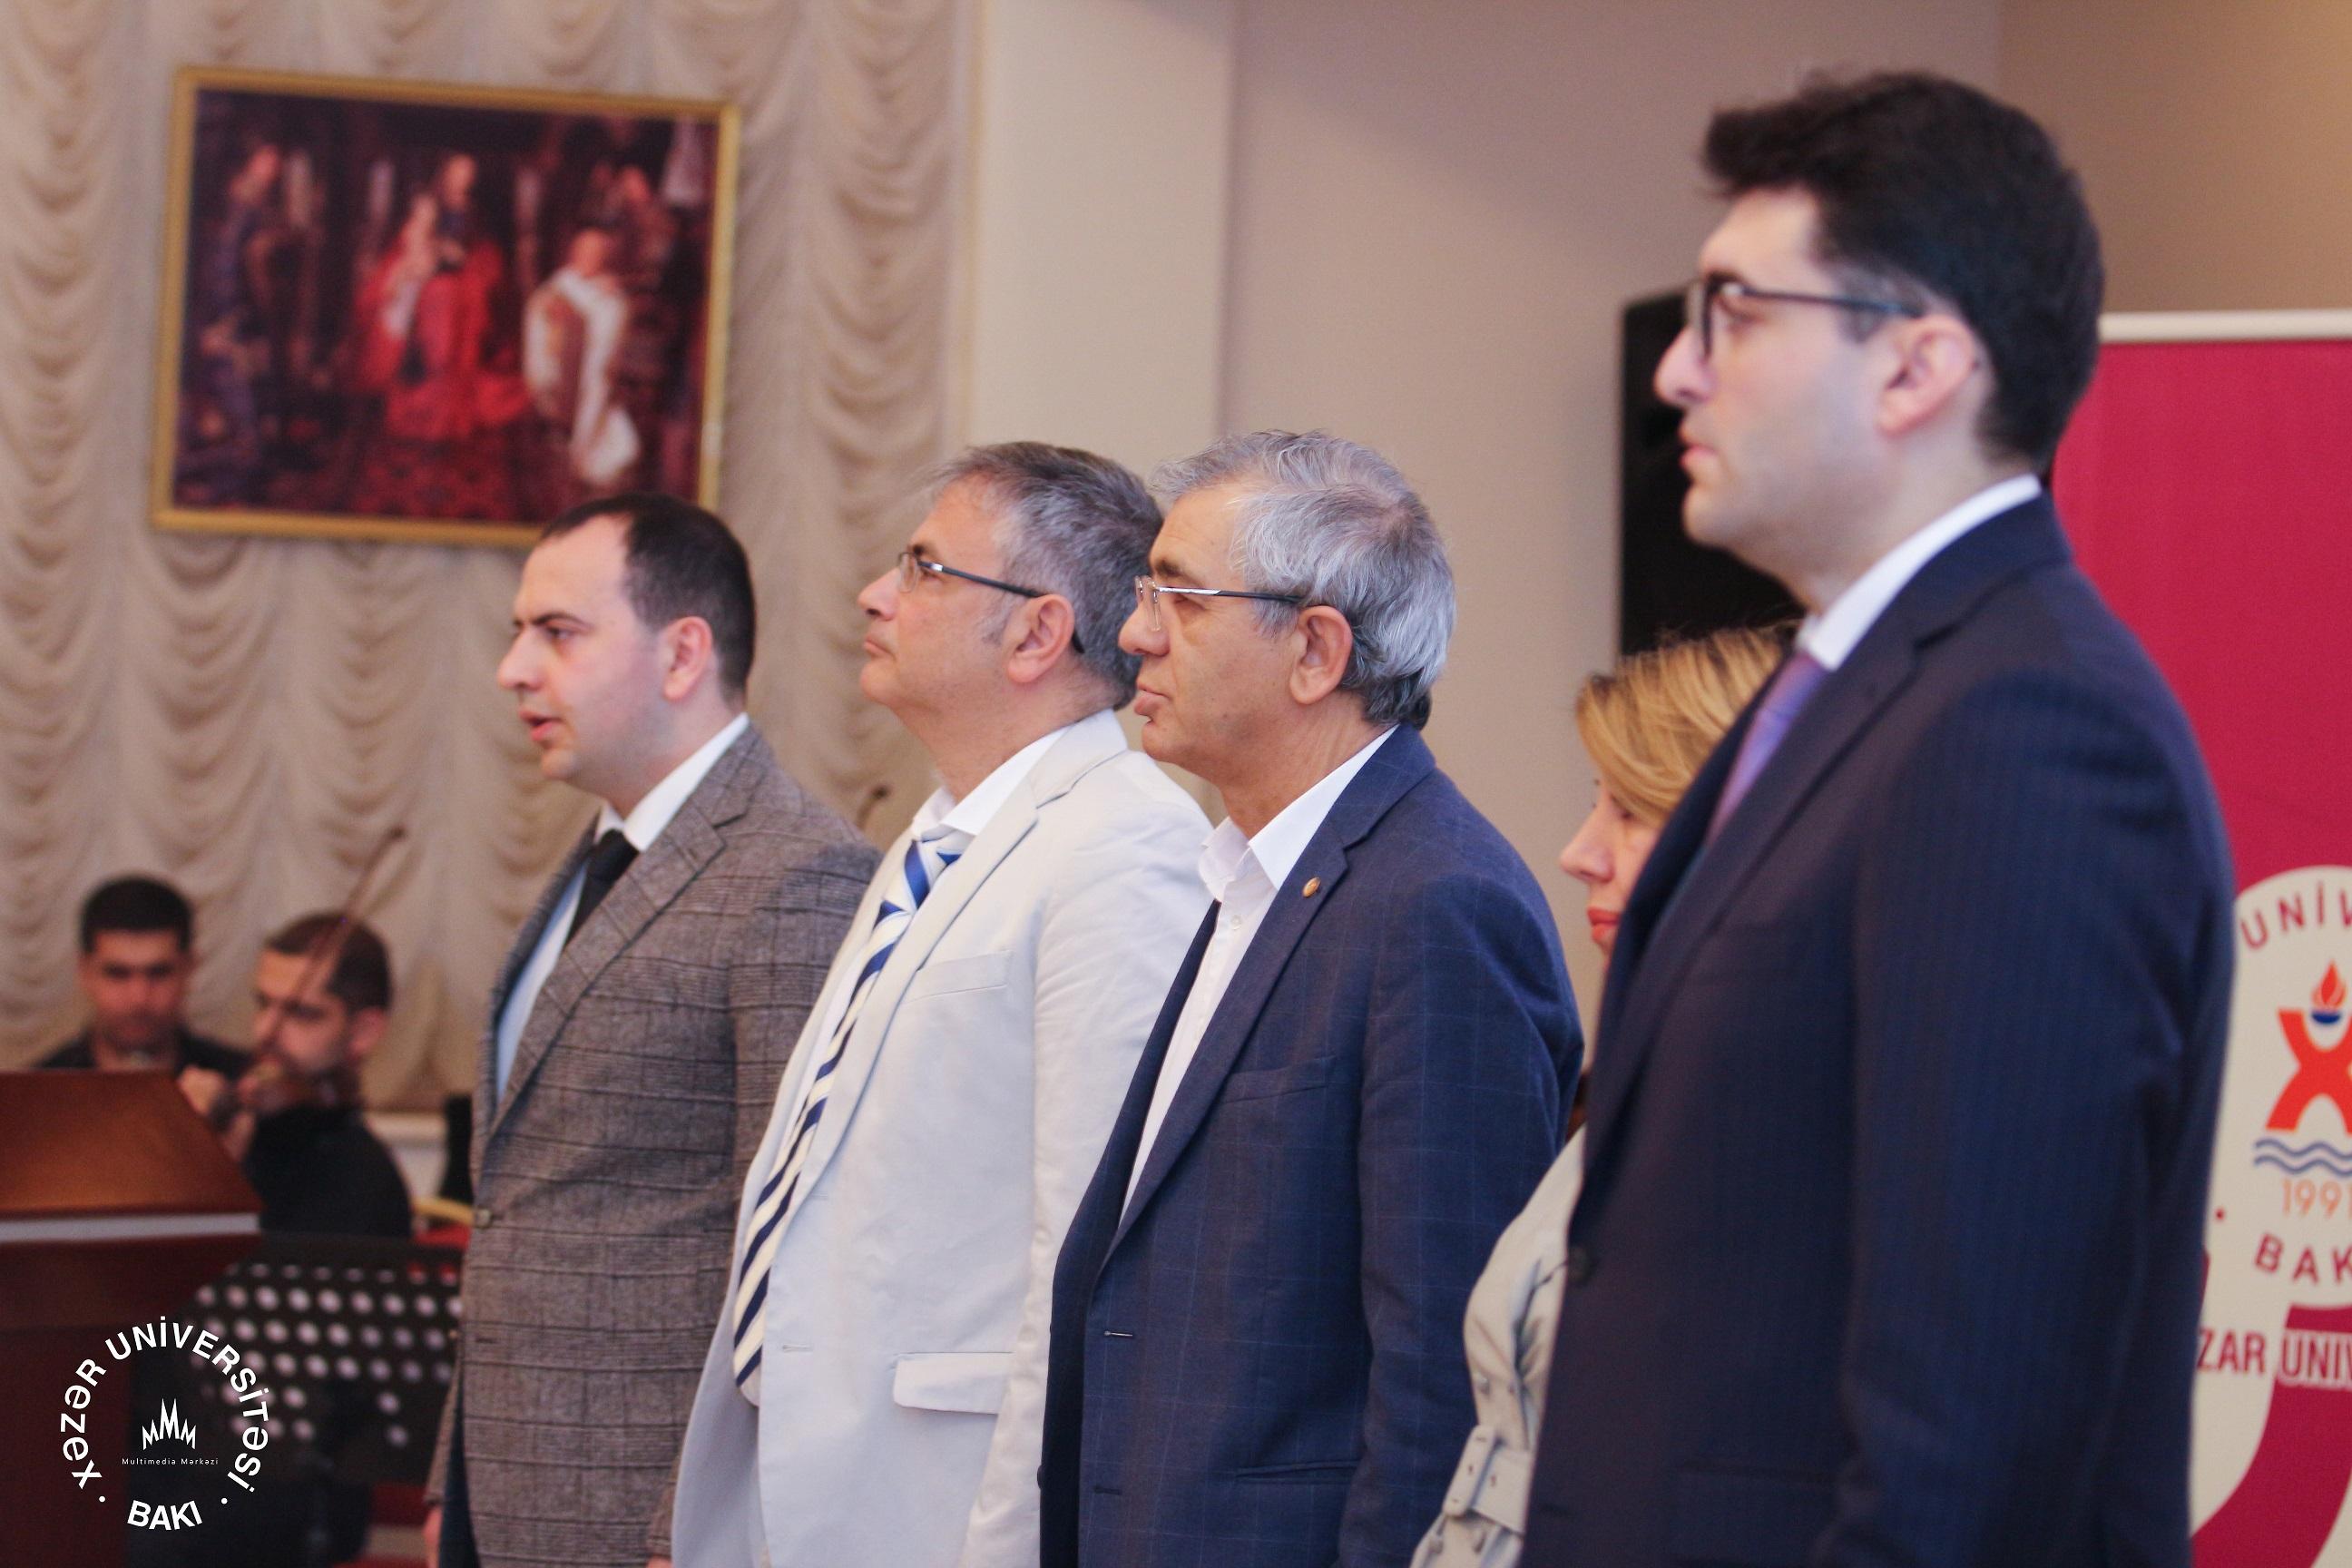 Jean Monnet Conference on the EU-Azerbaijan Relations